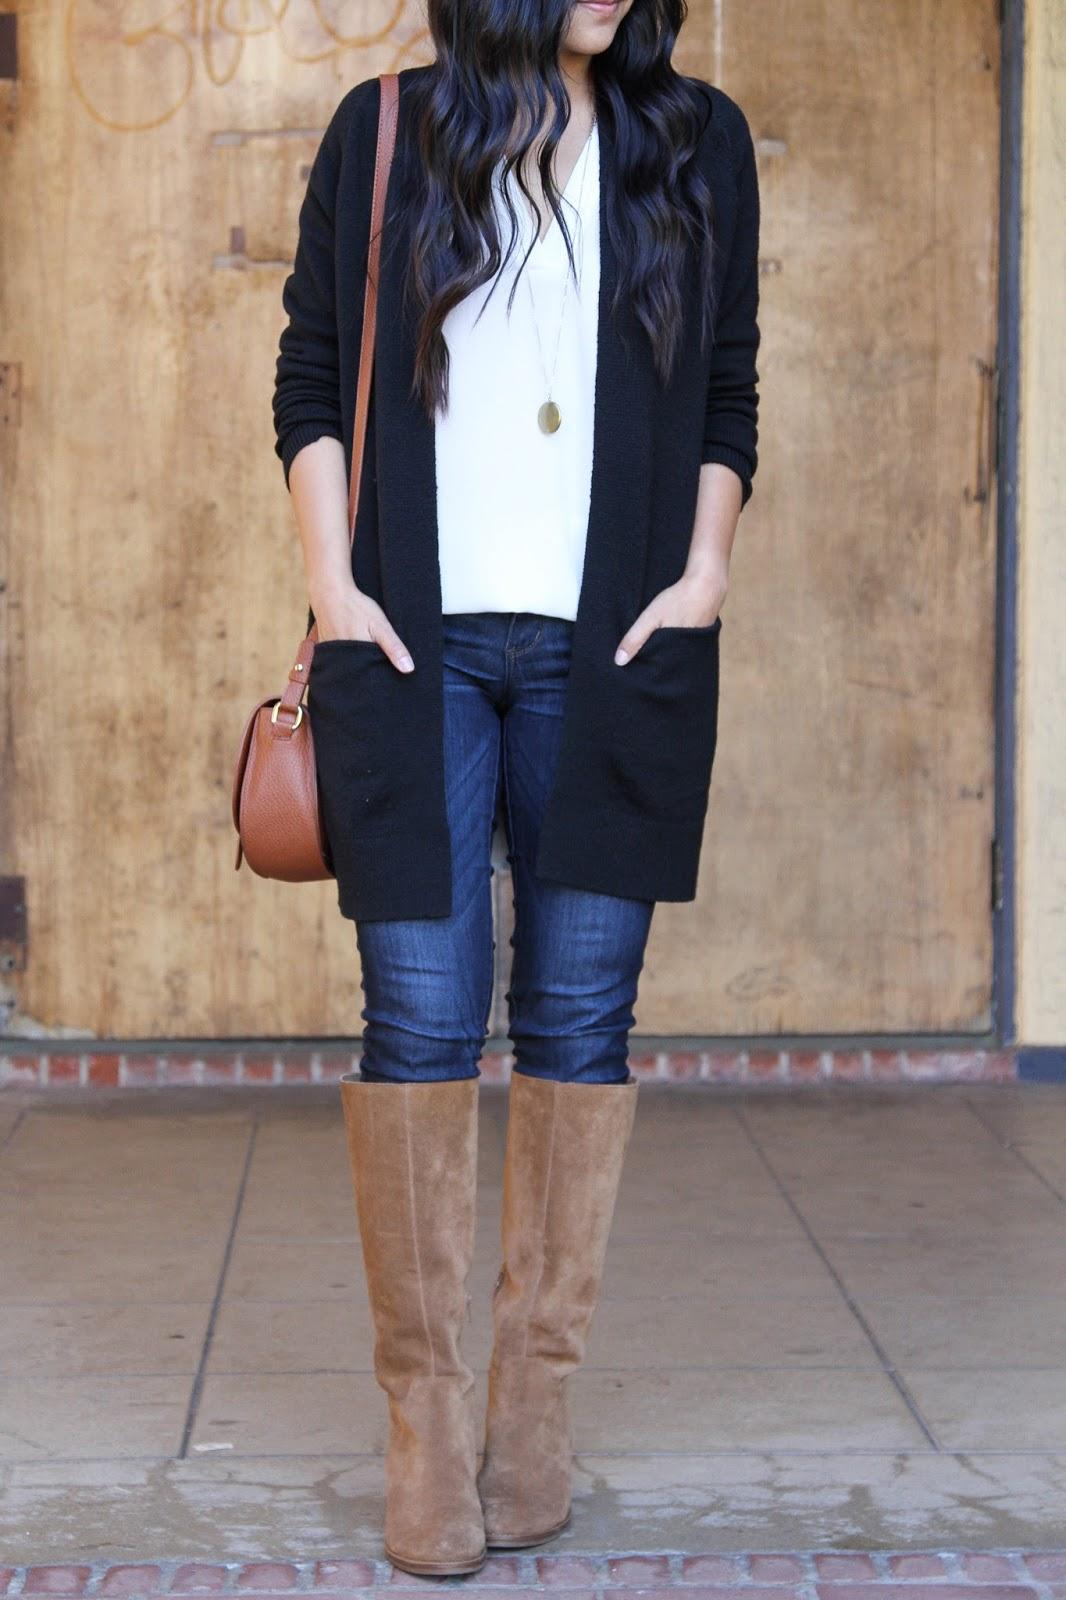 Black Cardigan + Pendant Necklace + White Tunic + Brown Bag